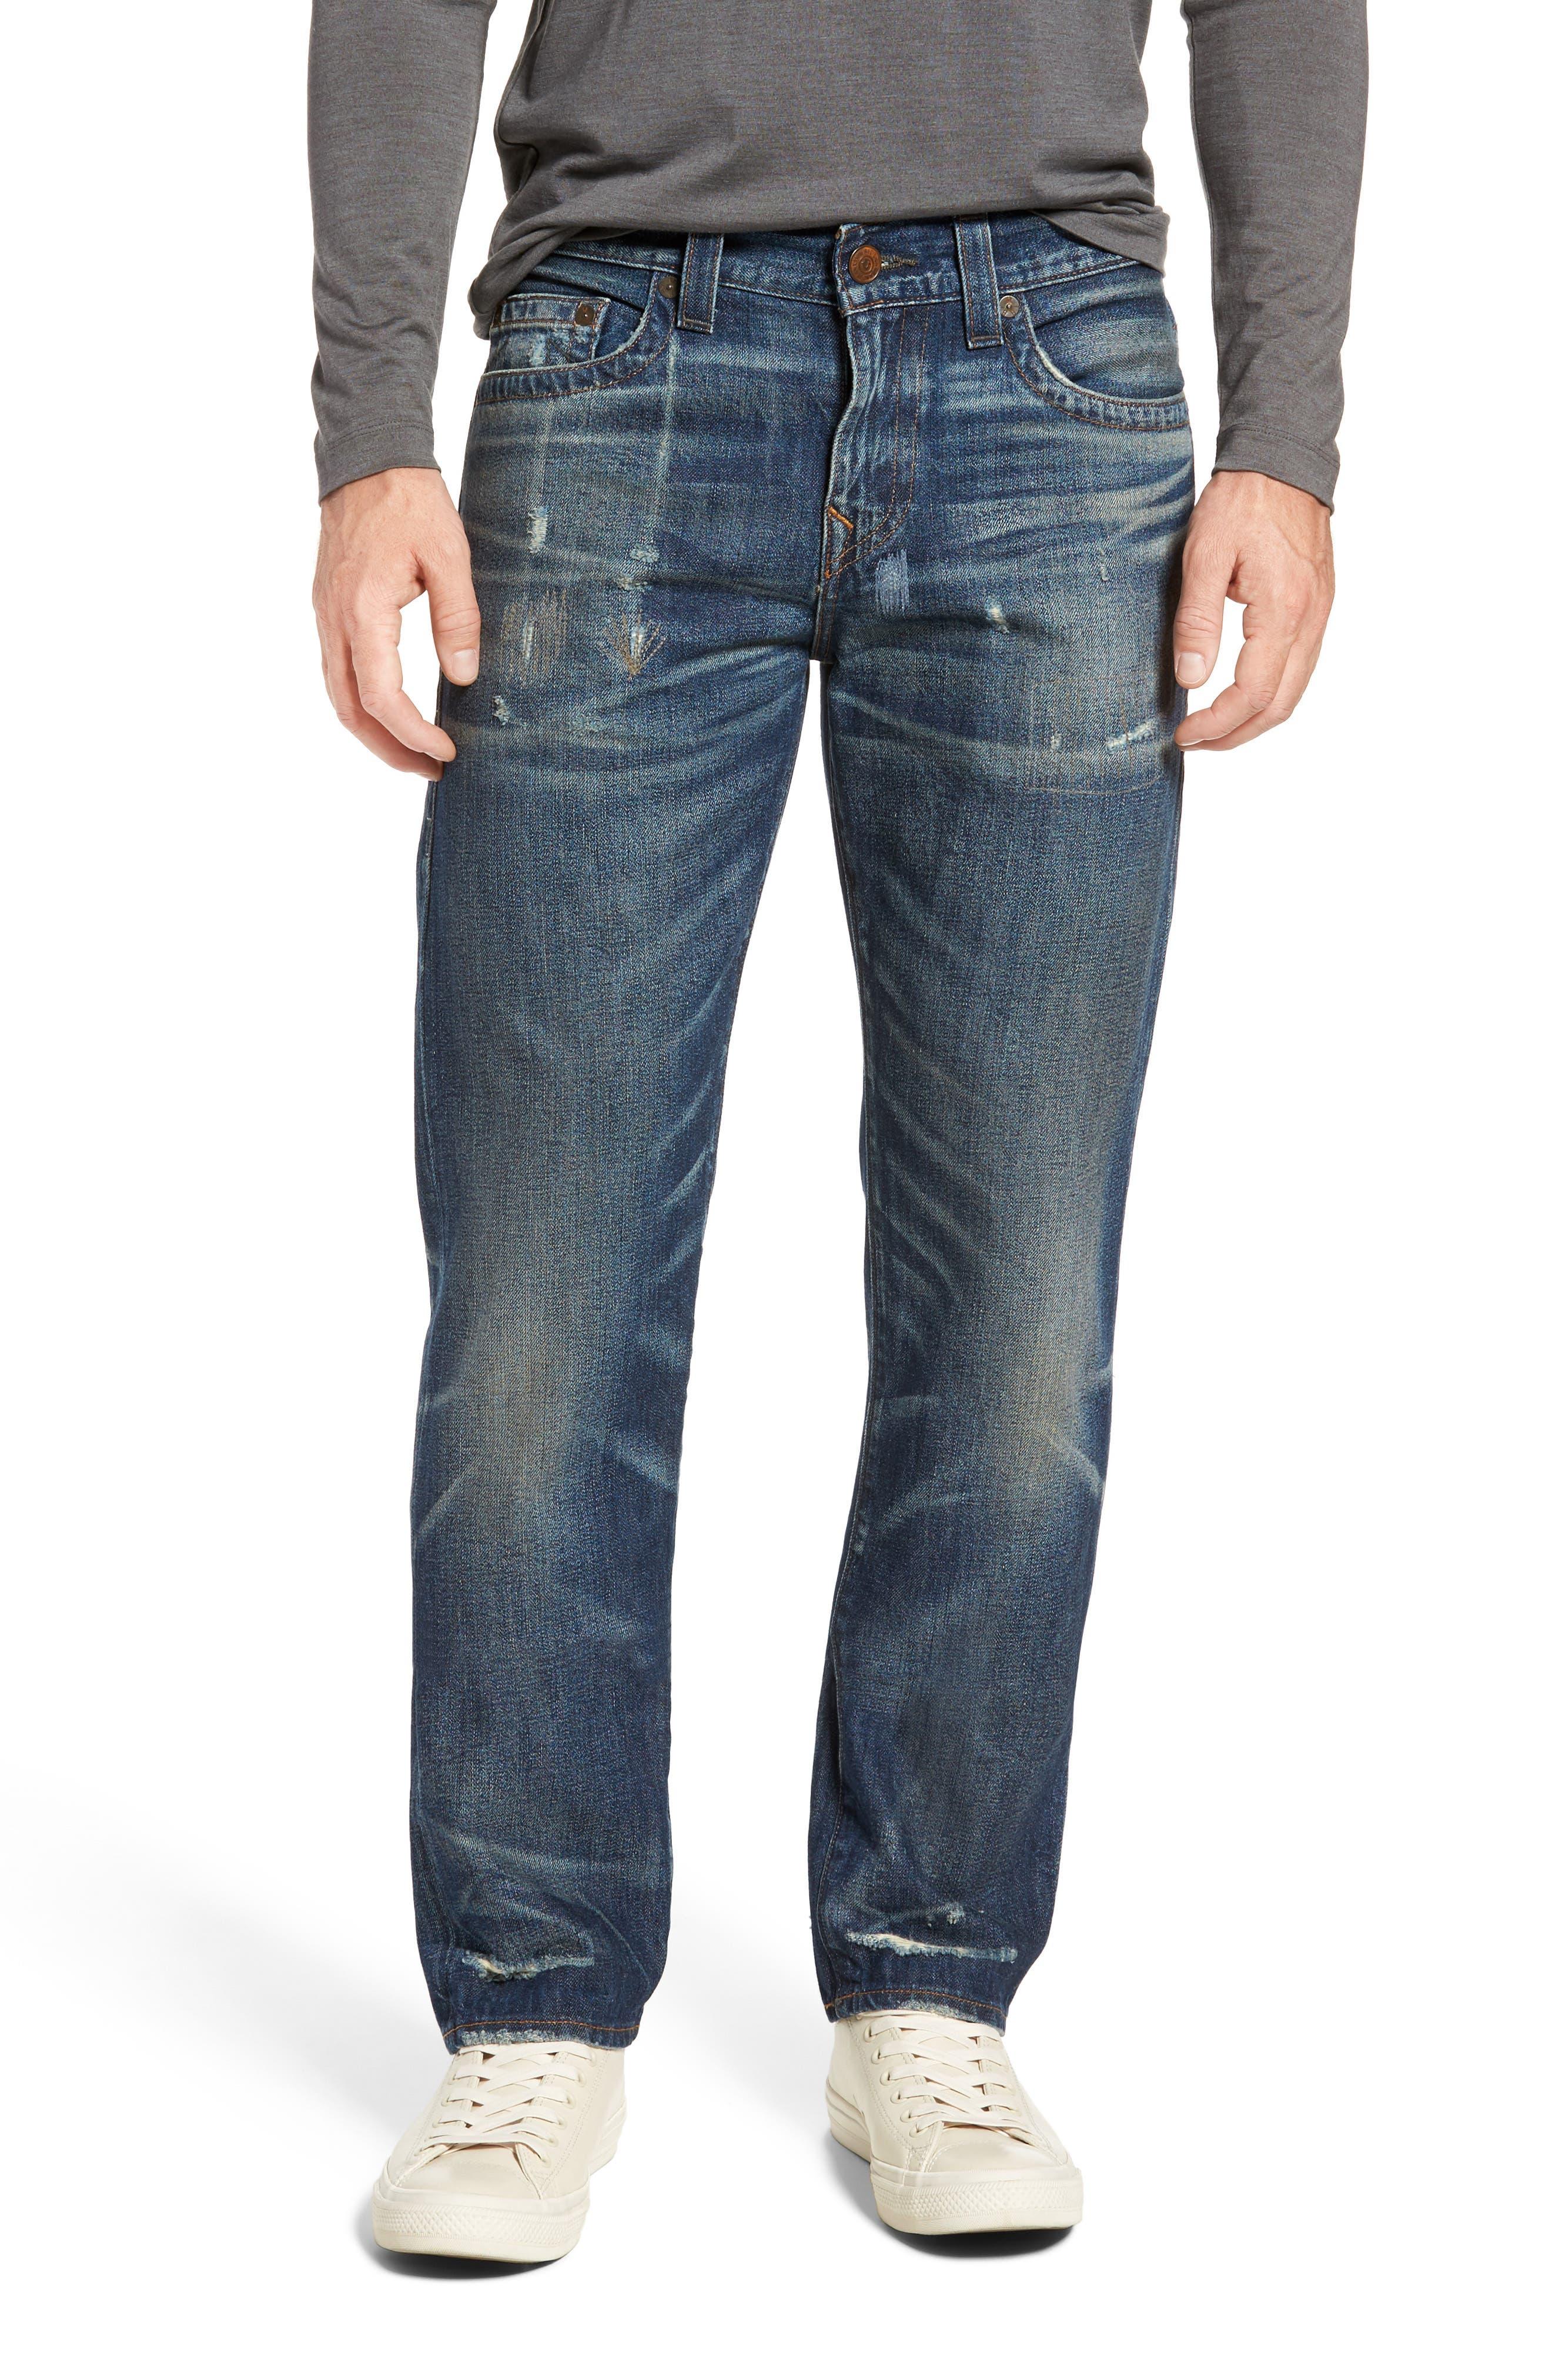 True Religion Brand Jeans Geno Straight Leg Jeans (Street Dweller)